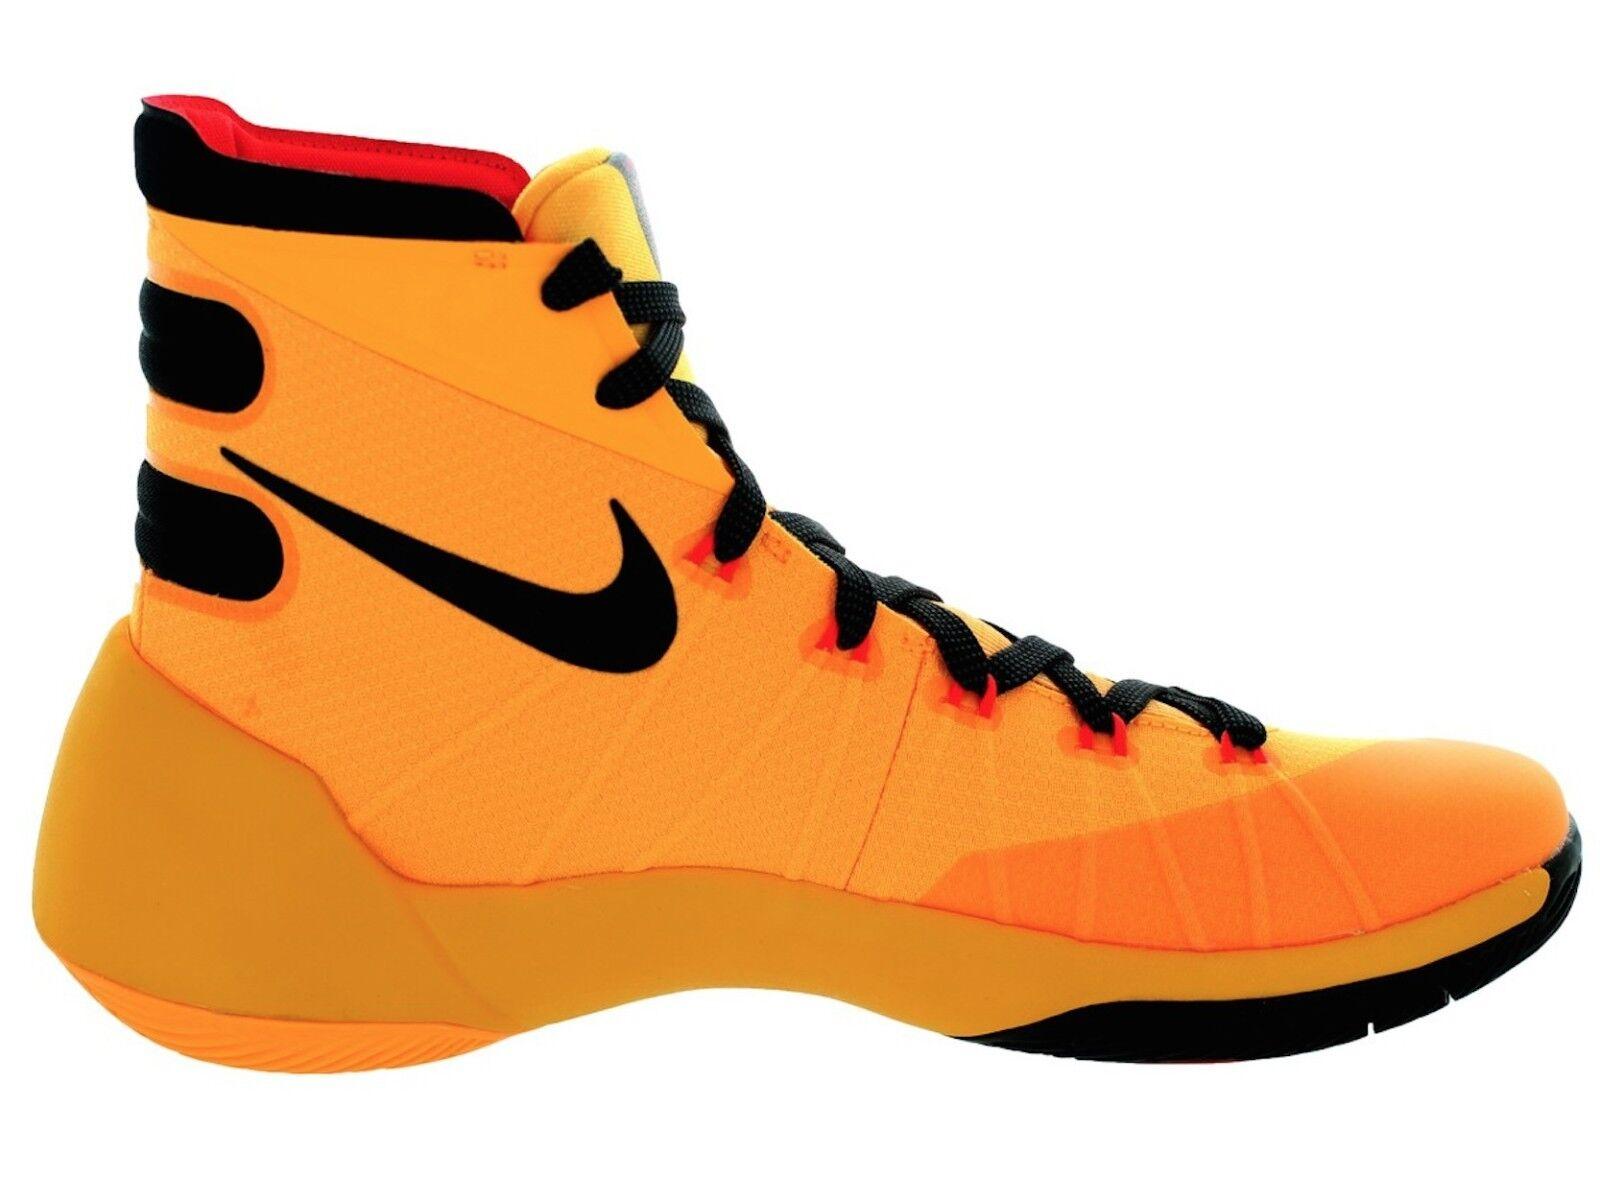 Nike Hyperdunk 2018 Basketball Shoe Laser Orange/Black/Bright Crmsn 749561 Sz 13